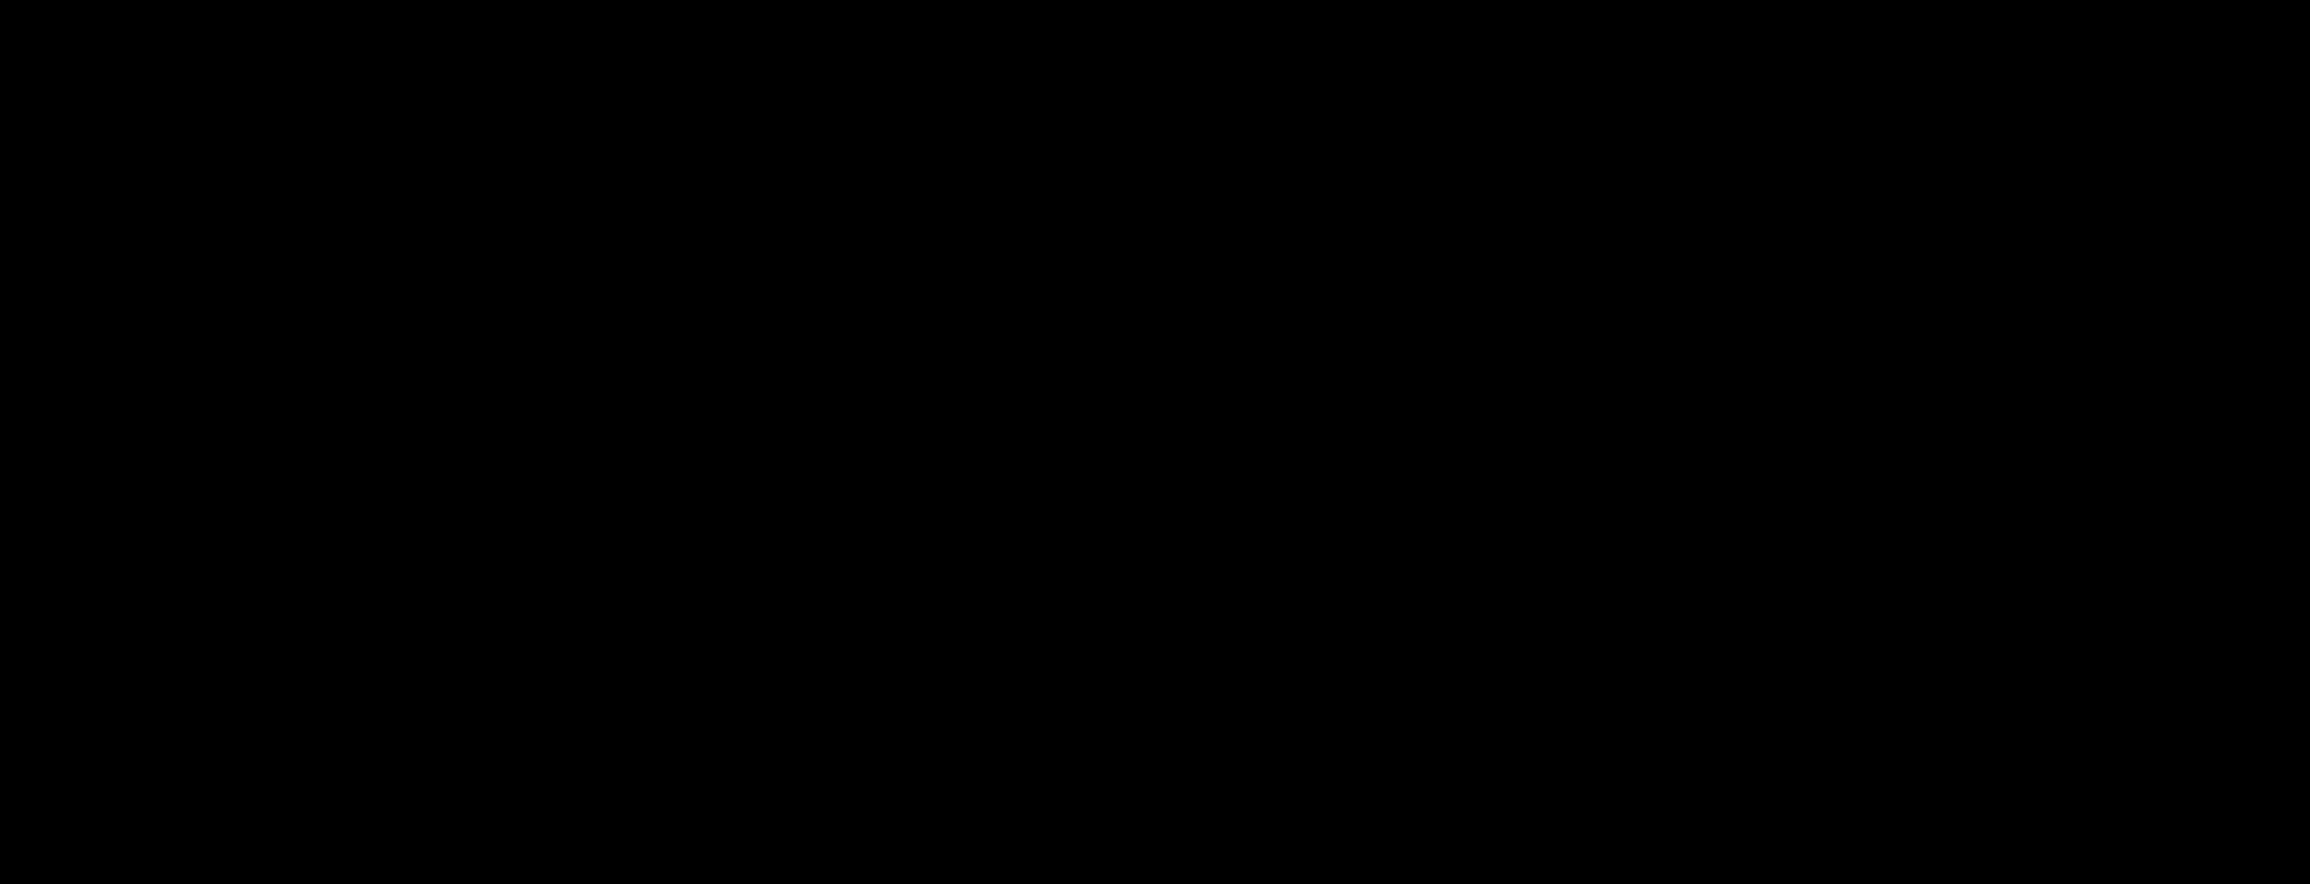 Silhouette at getdrawings com. Clipart dinosaur dinosaur skeleton